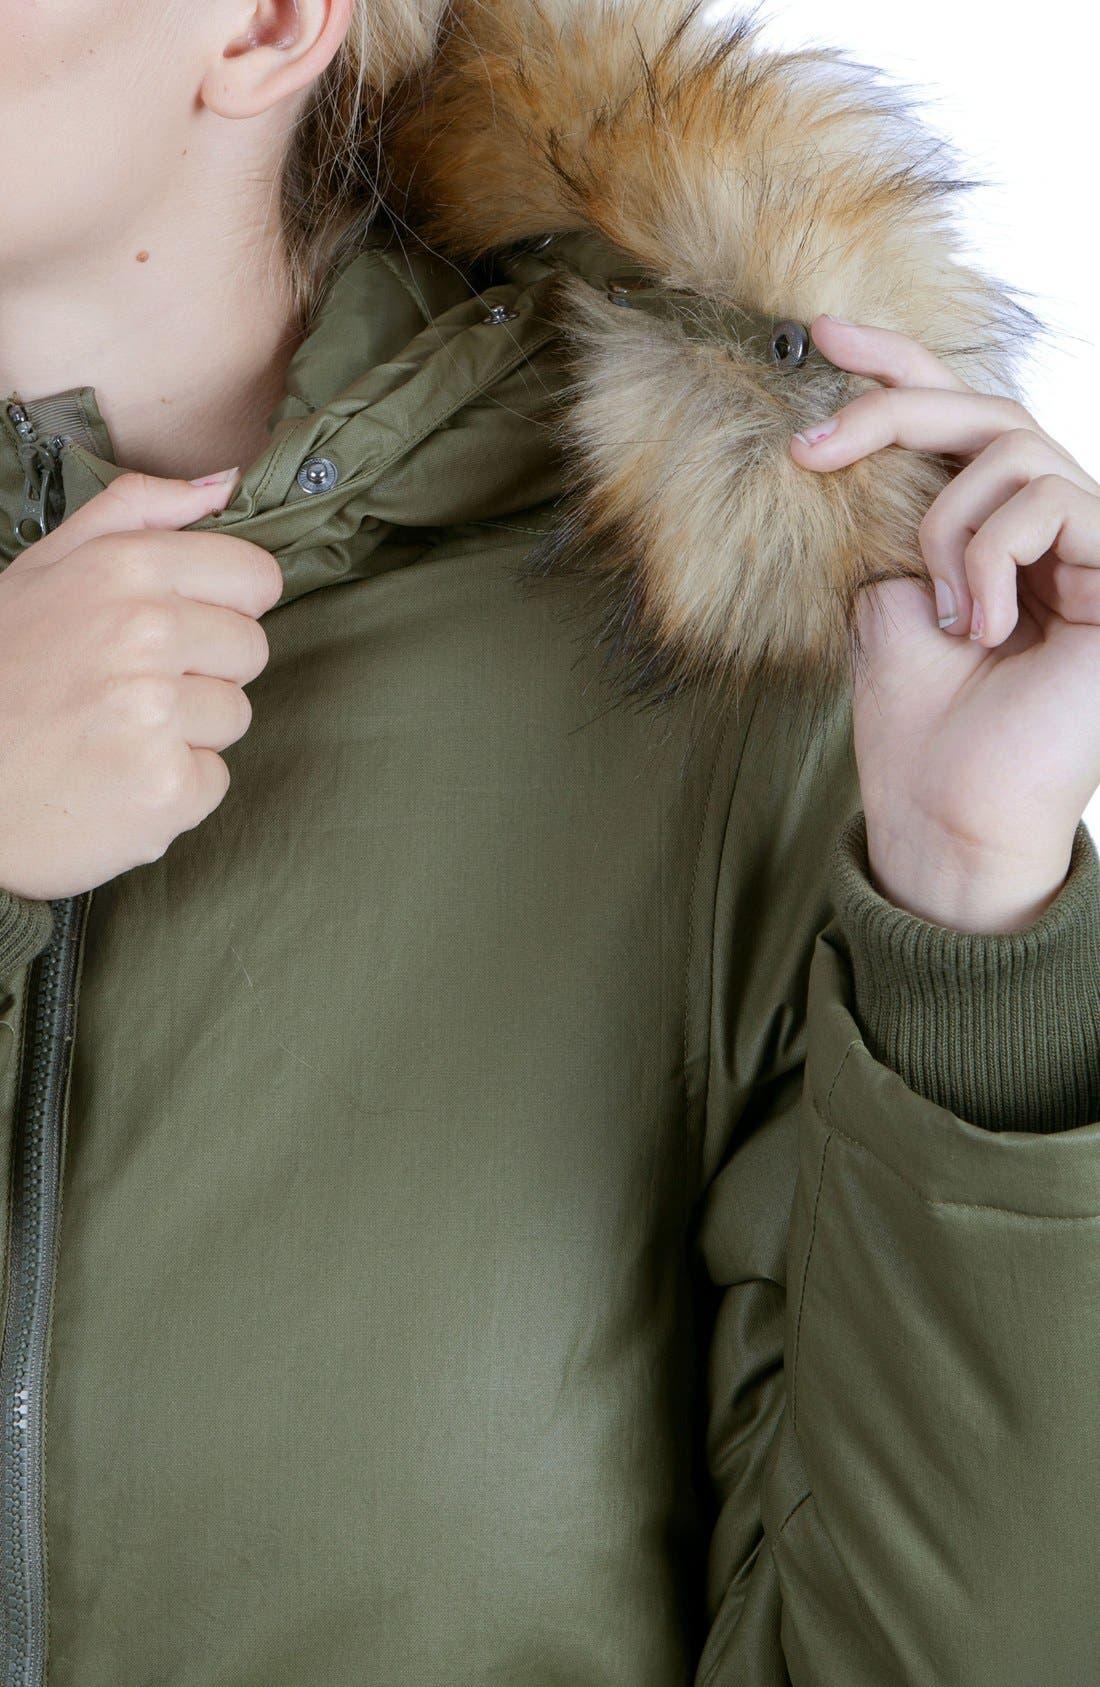 Sofia Waxed 3-in-1 Maternity/Nursing Jacket with Faux Fur Trim,                             Alternate thumbnail 6, color,                             KHAKI GREEN